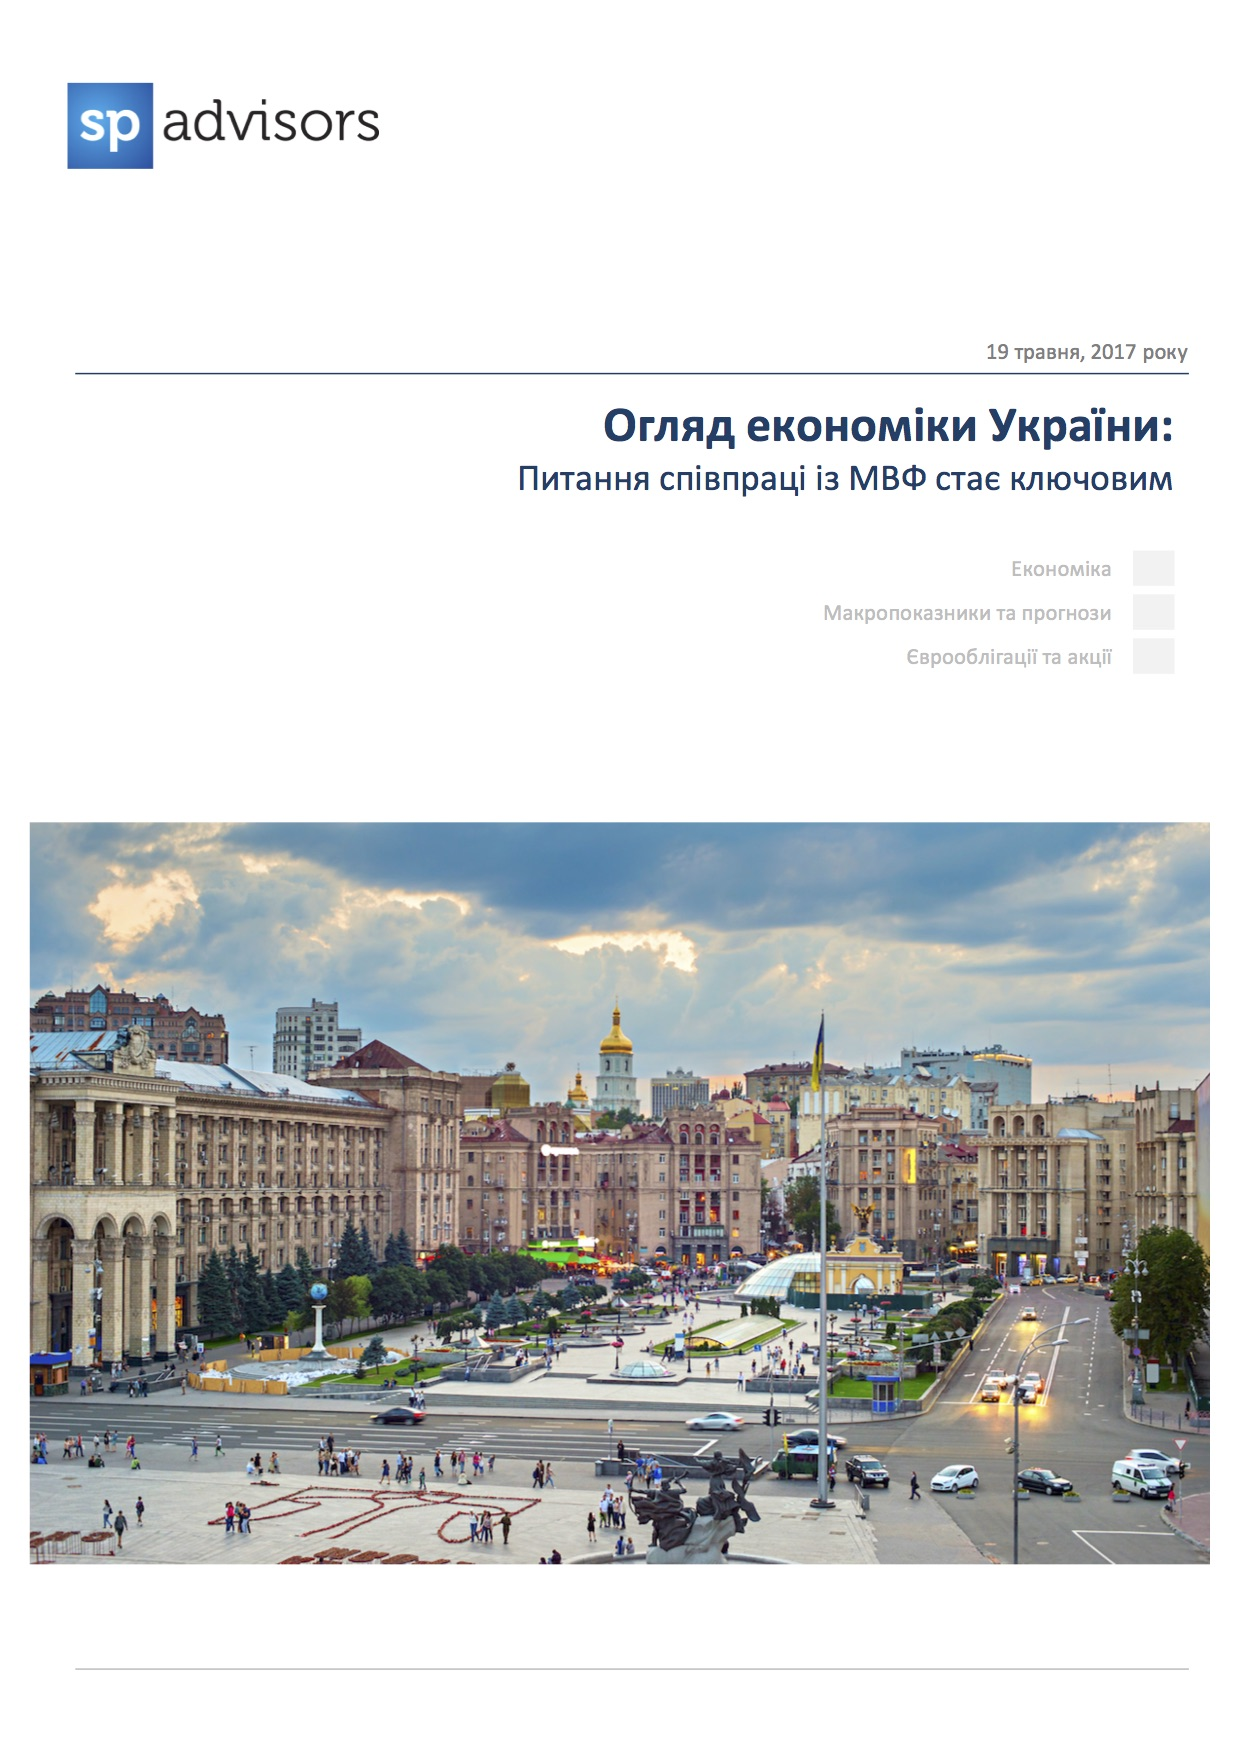 ukr macro may-19 2017 ukr